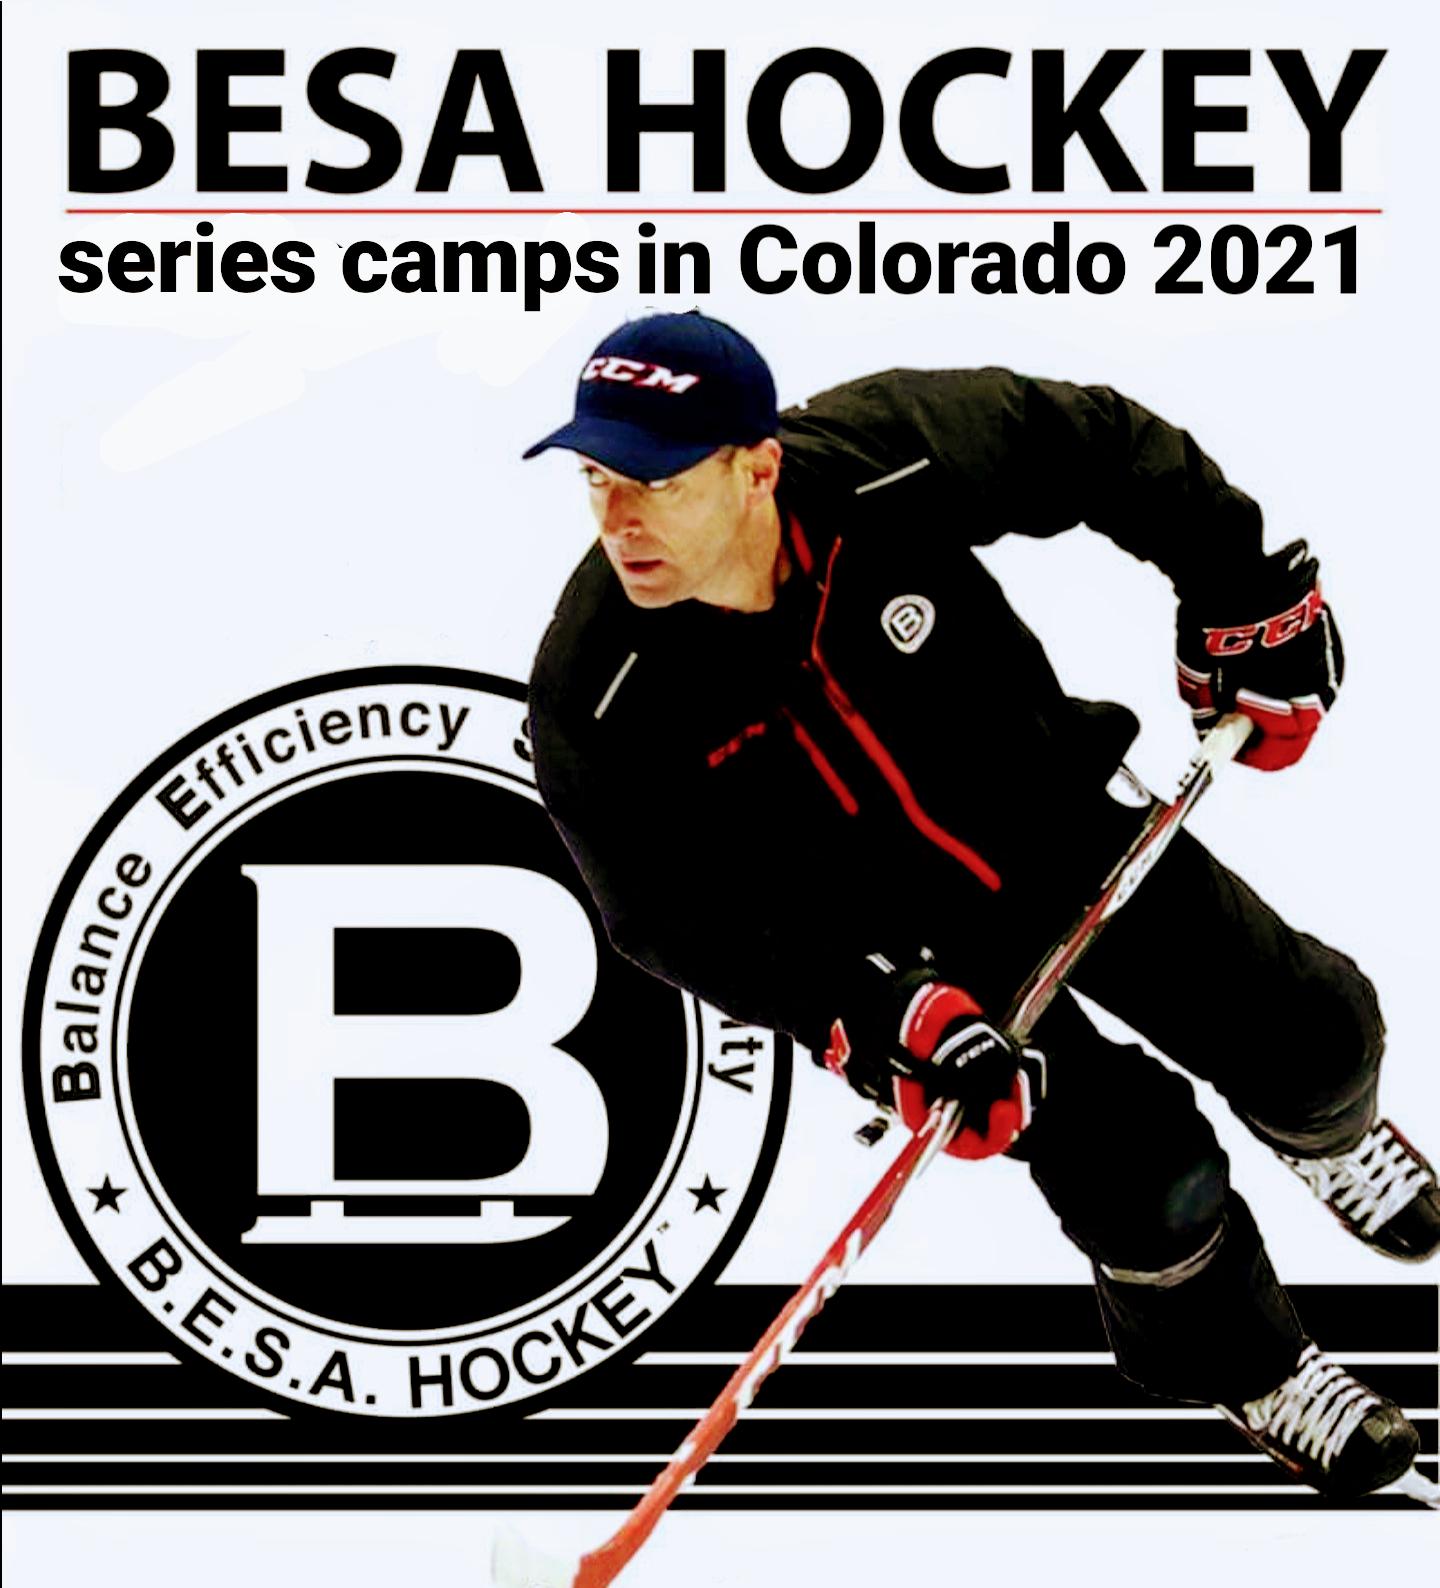 BESA HOCKEY Denver Colorado. Group A